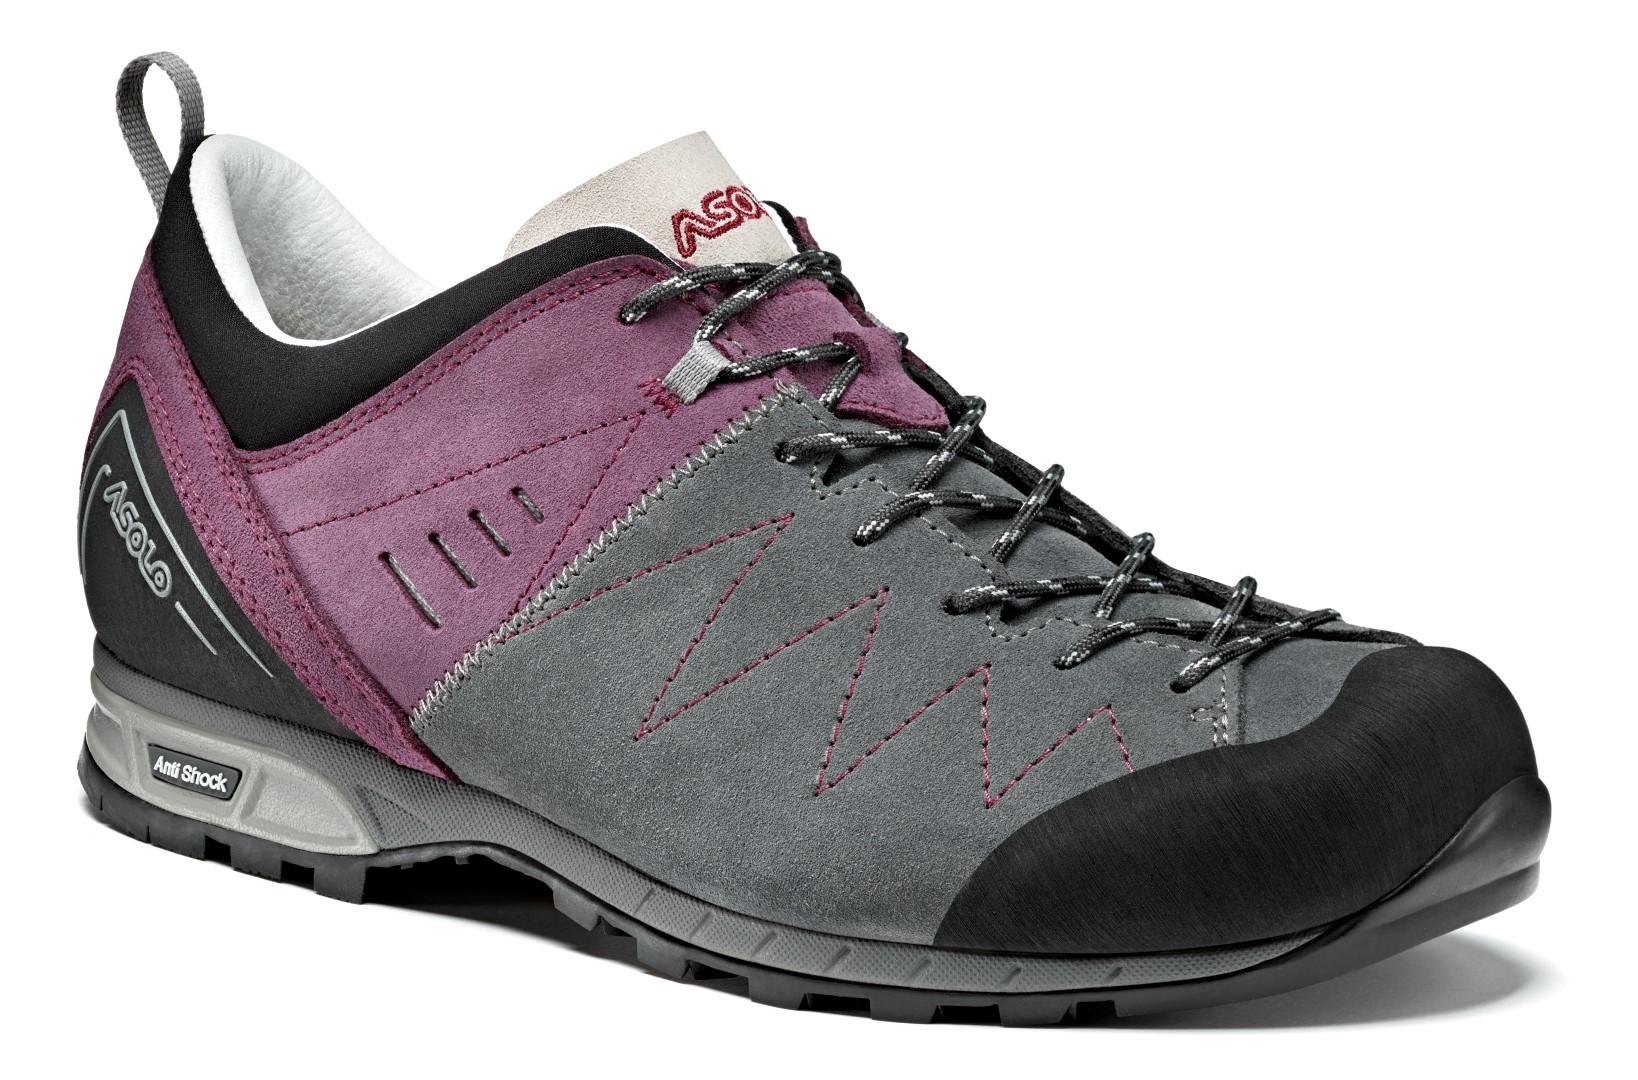 Кроссовки Asolo Track, grigio/grapeade, 4.5 UK